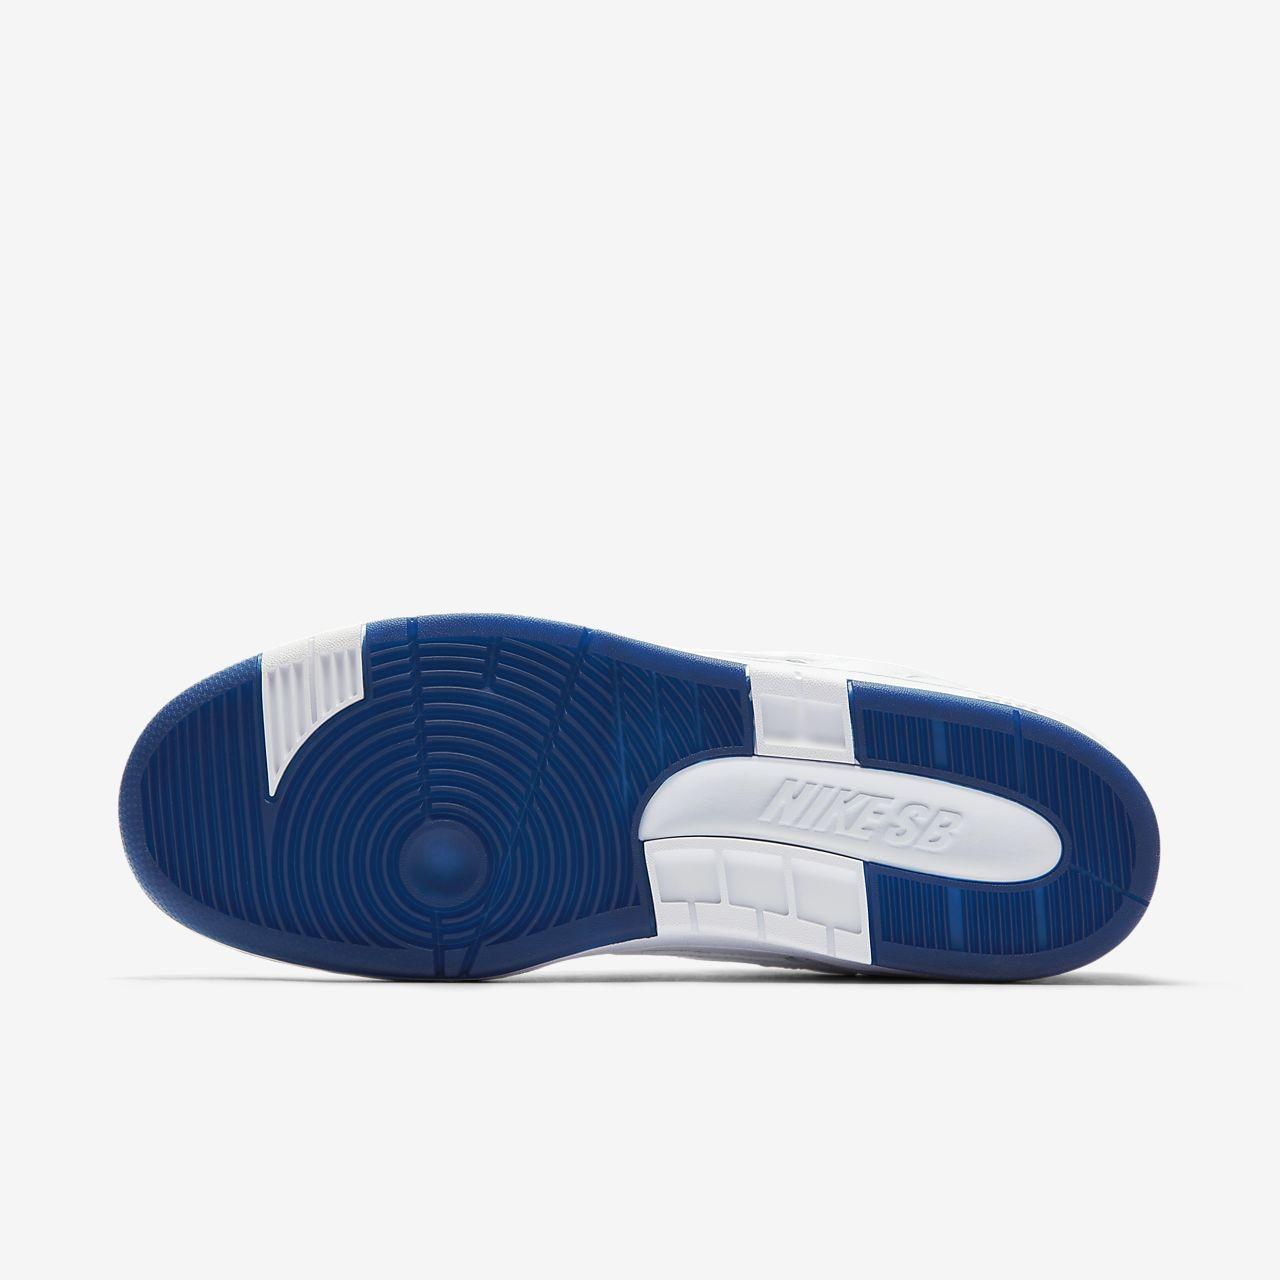 huge selection of 0fa6b cad48 Nike SB Air Force II Low Men's Skateboarding Shoe. Nike.com ID